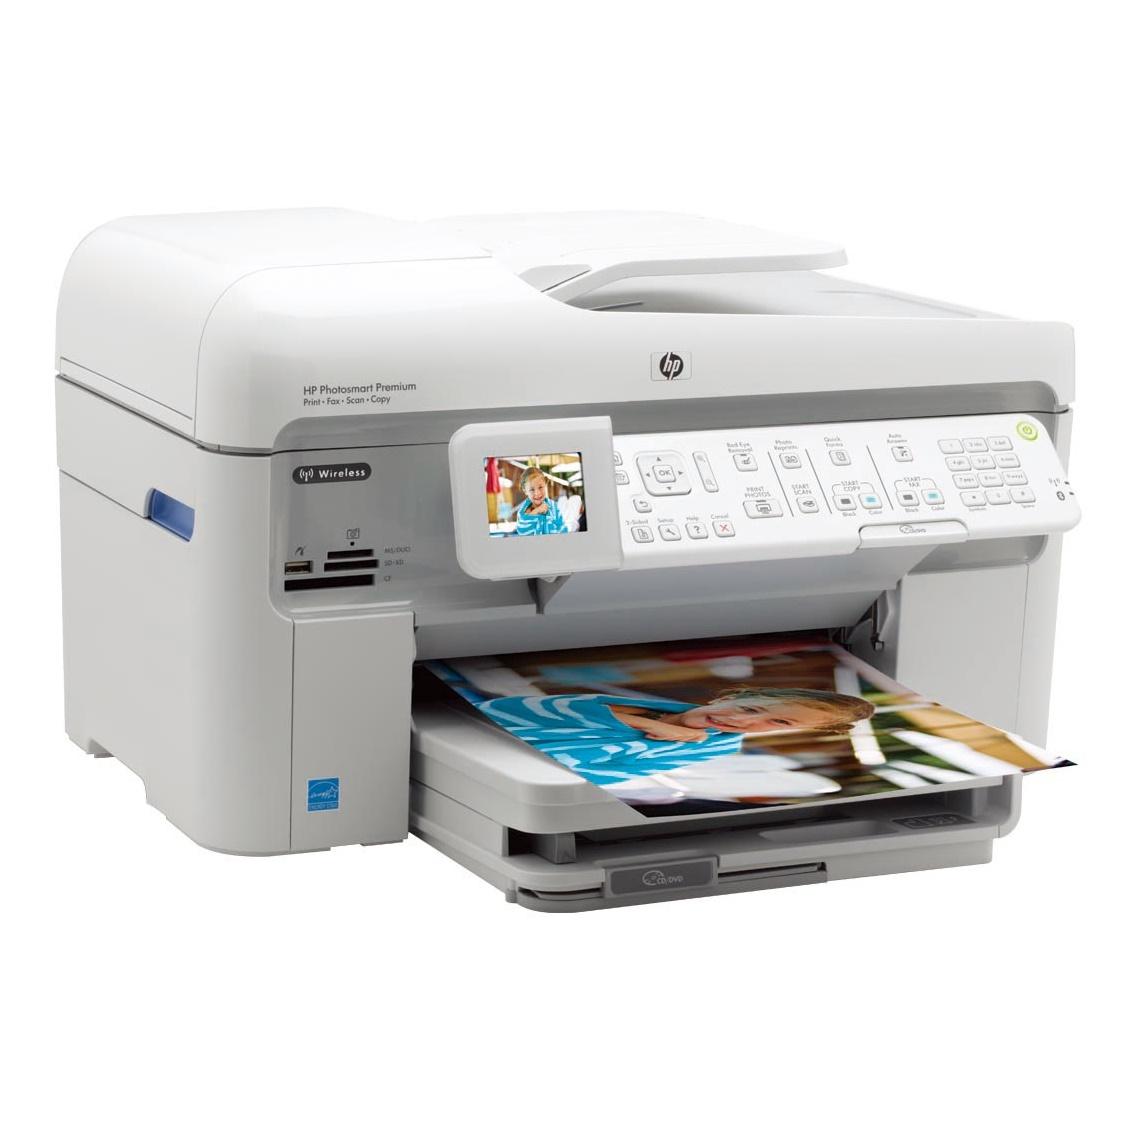 HP 364 CB316EE STD Black Original Ink Cartridge - Argos Hp photosmart c309a not printing black